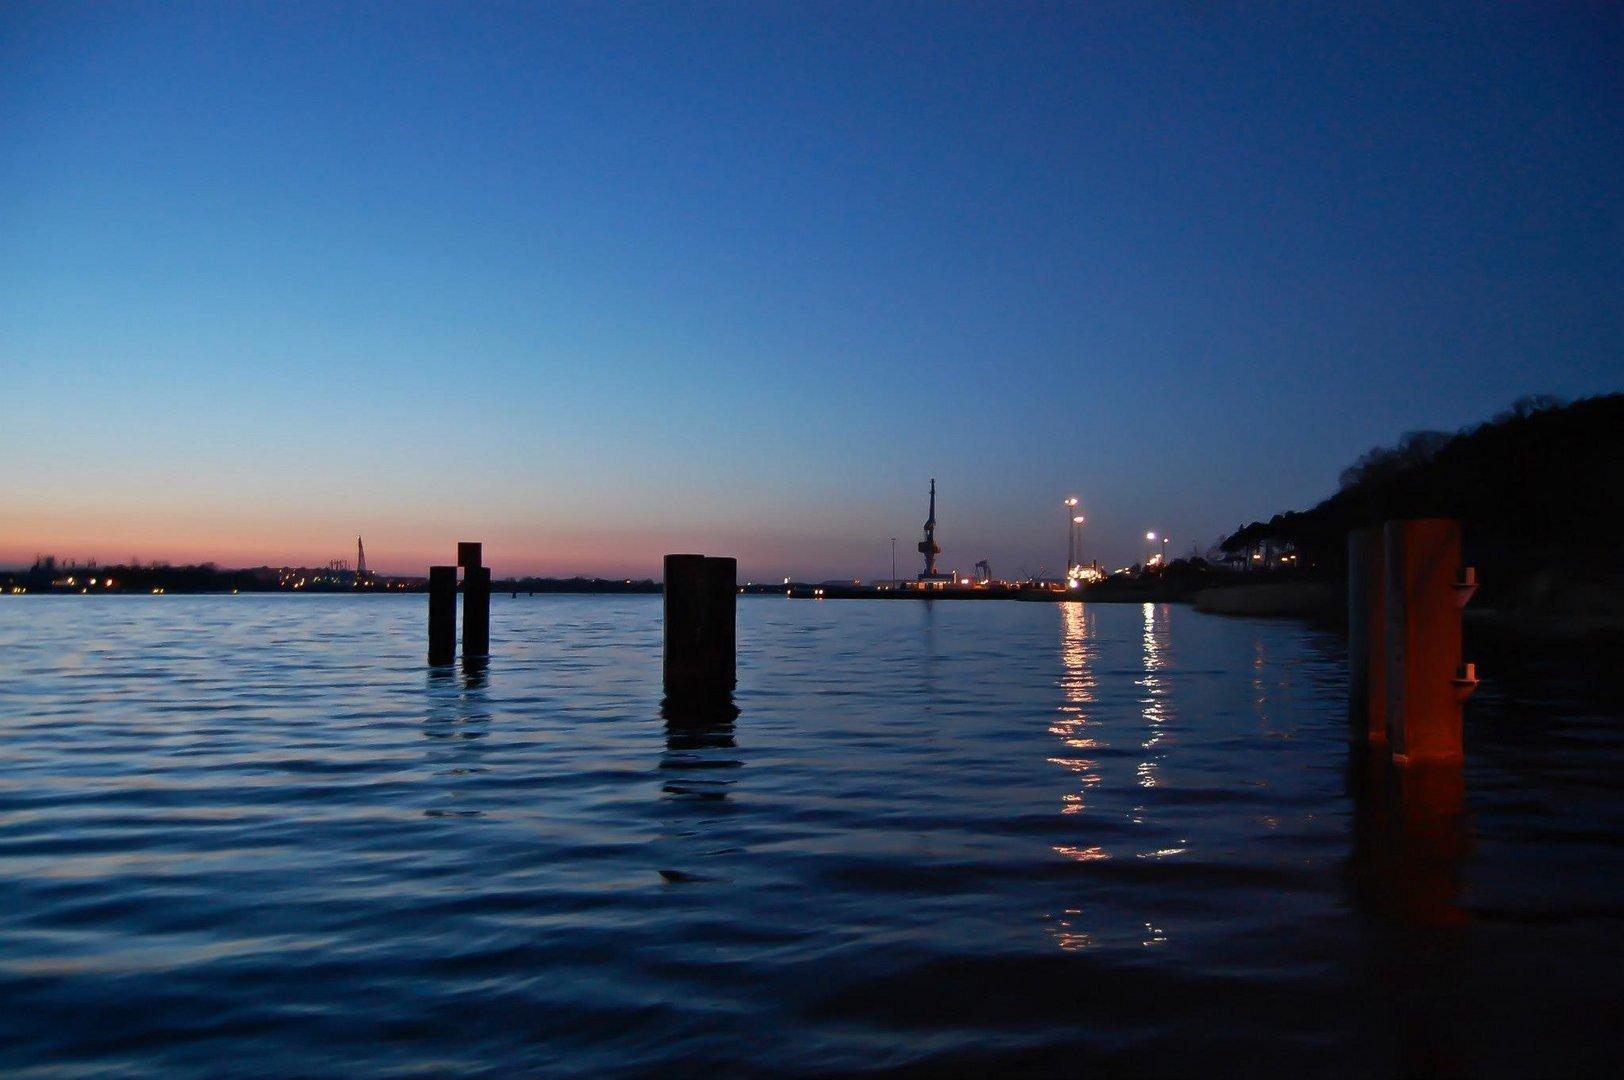 Rostocker City bei Nacht